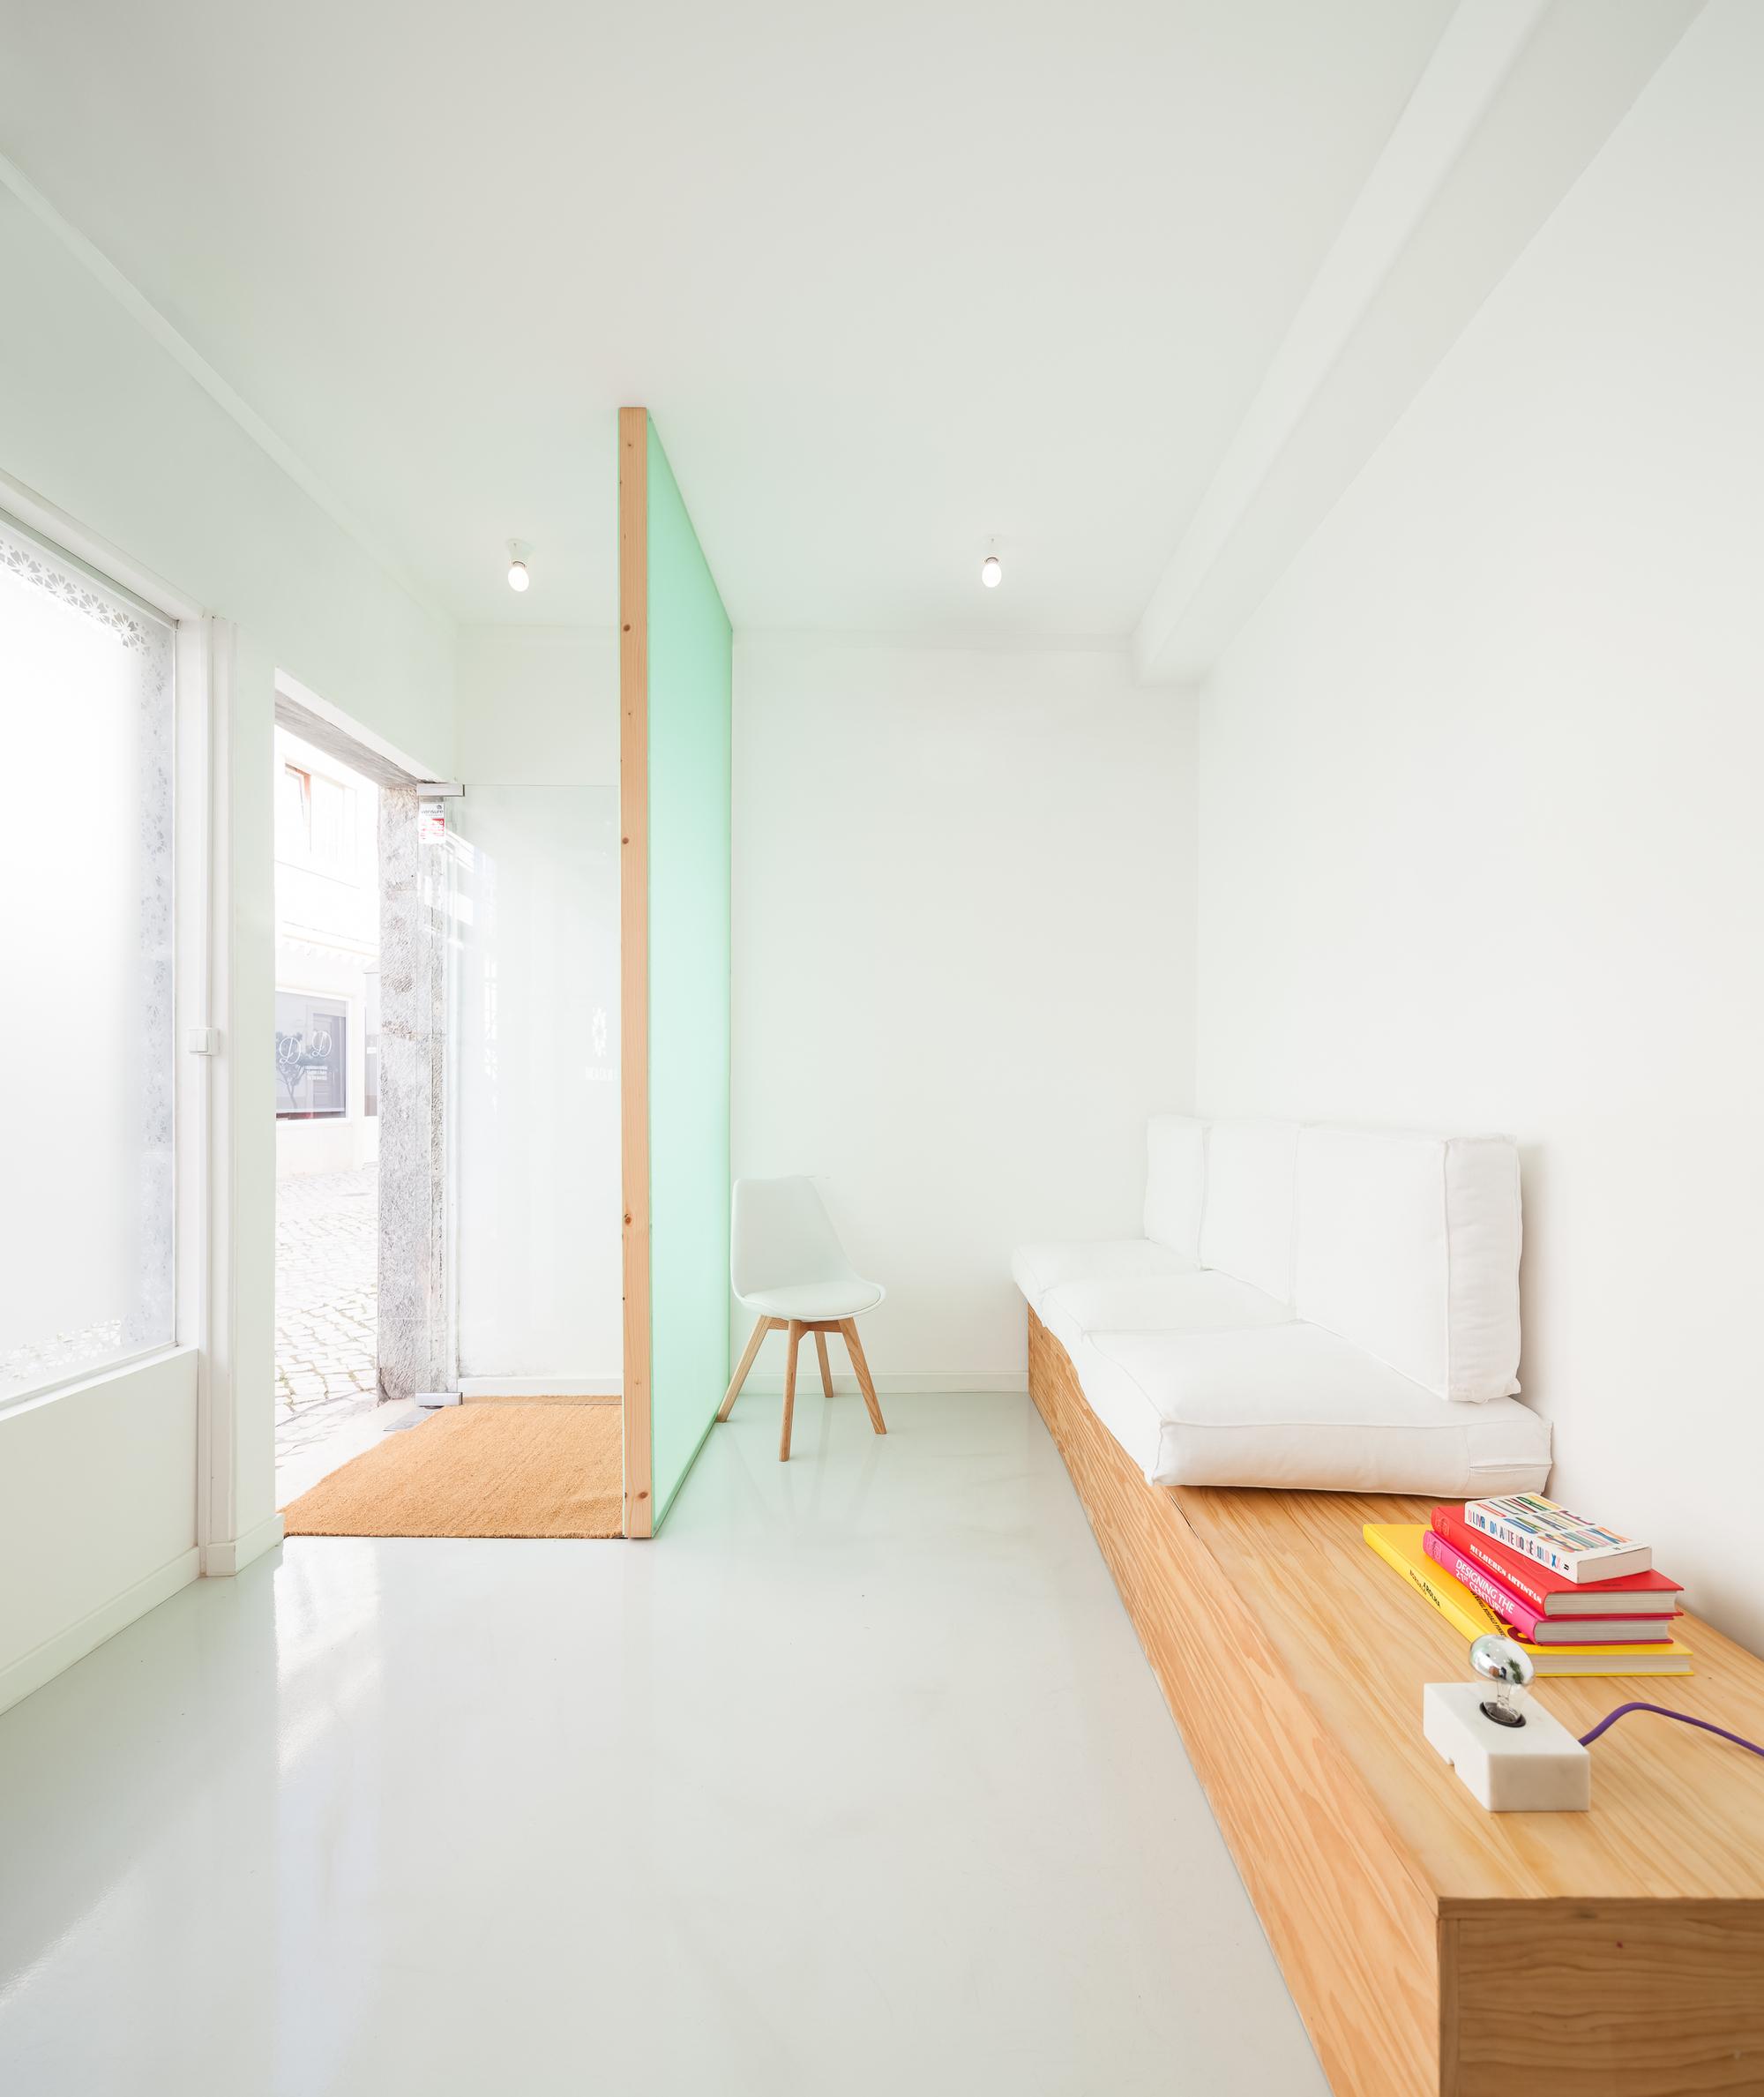 galeria de clinica da vila dc ad 3. Black Bedroom Furniture Sets. Home Design Ideas